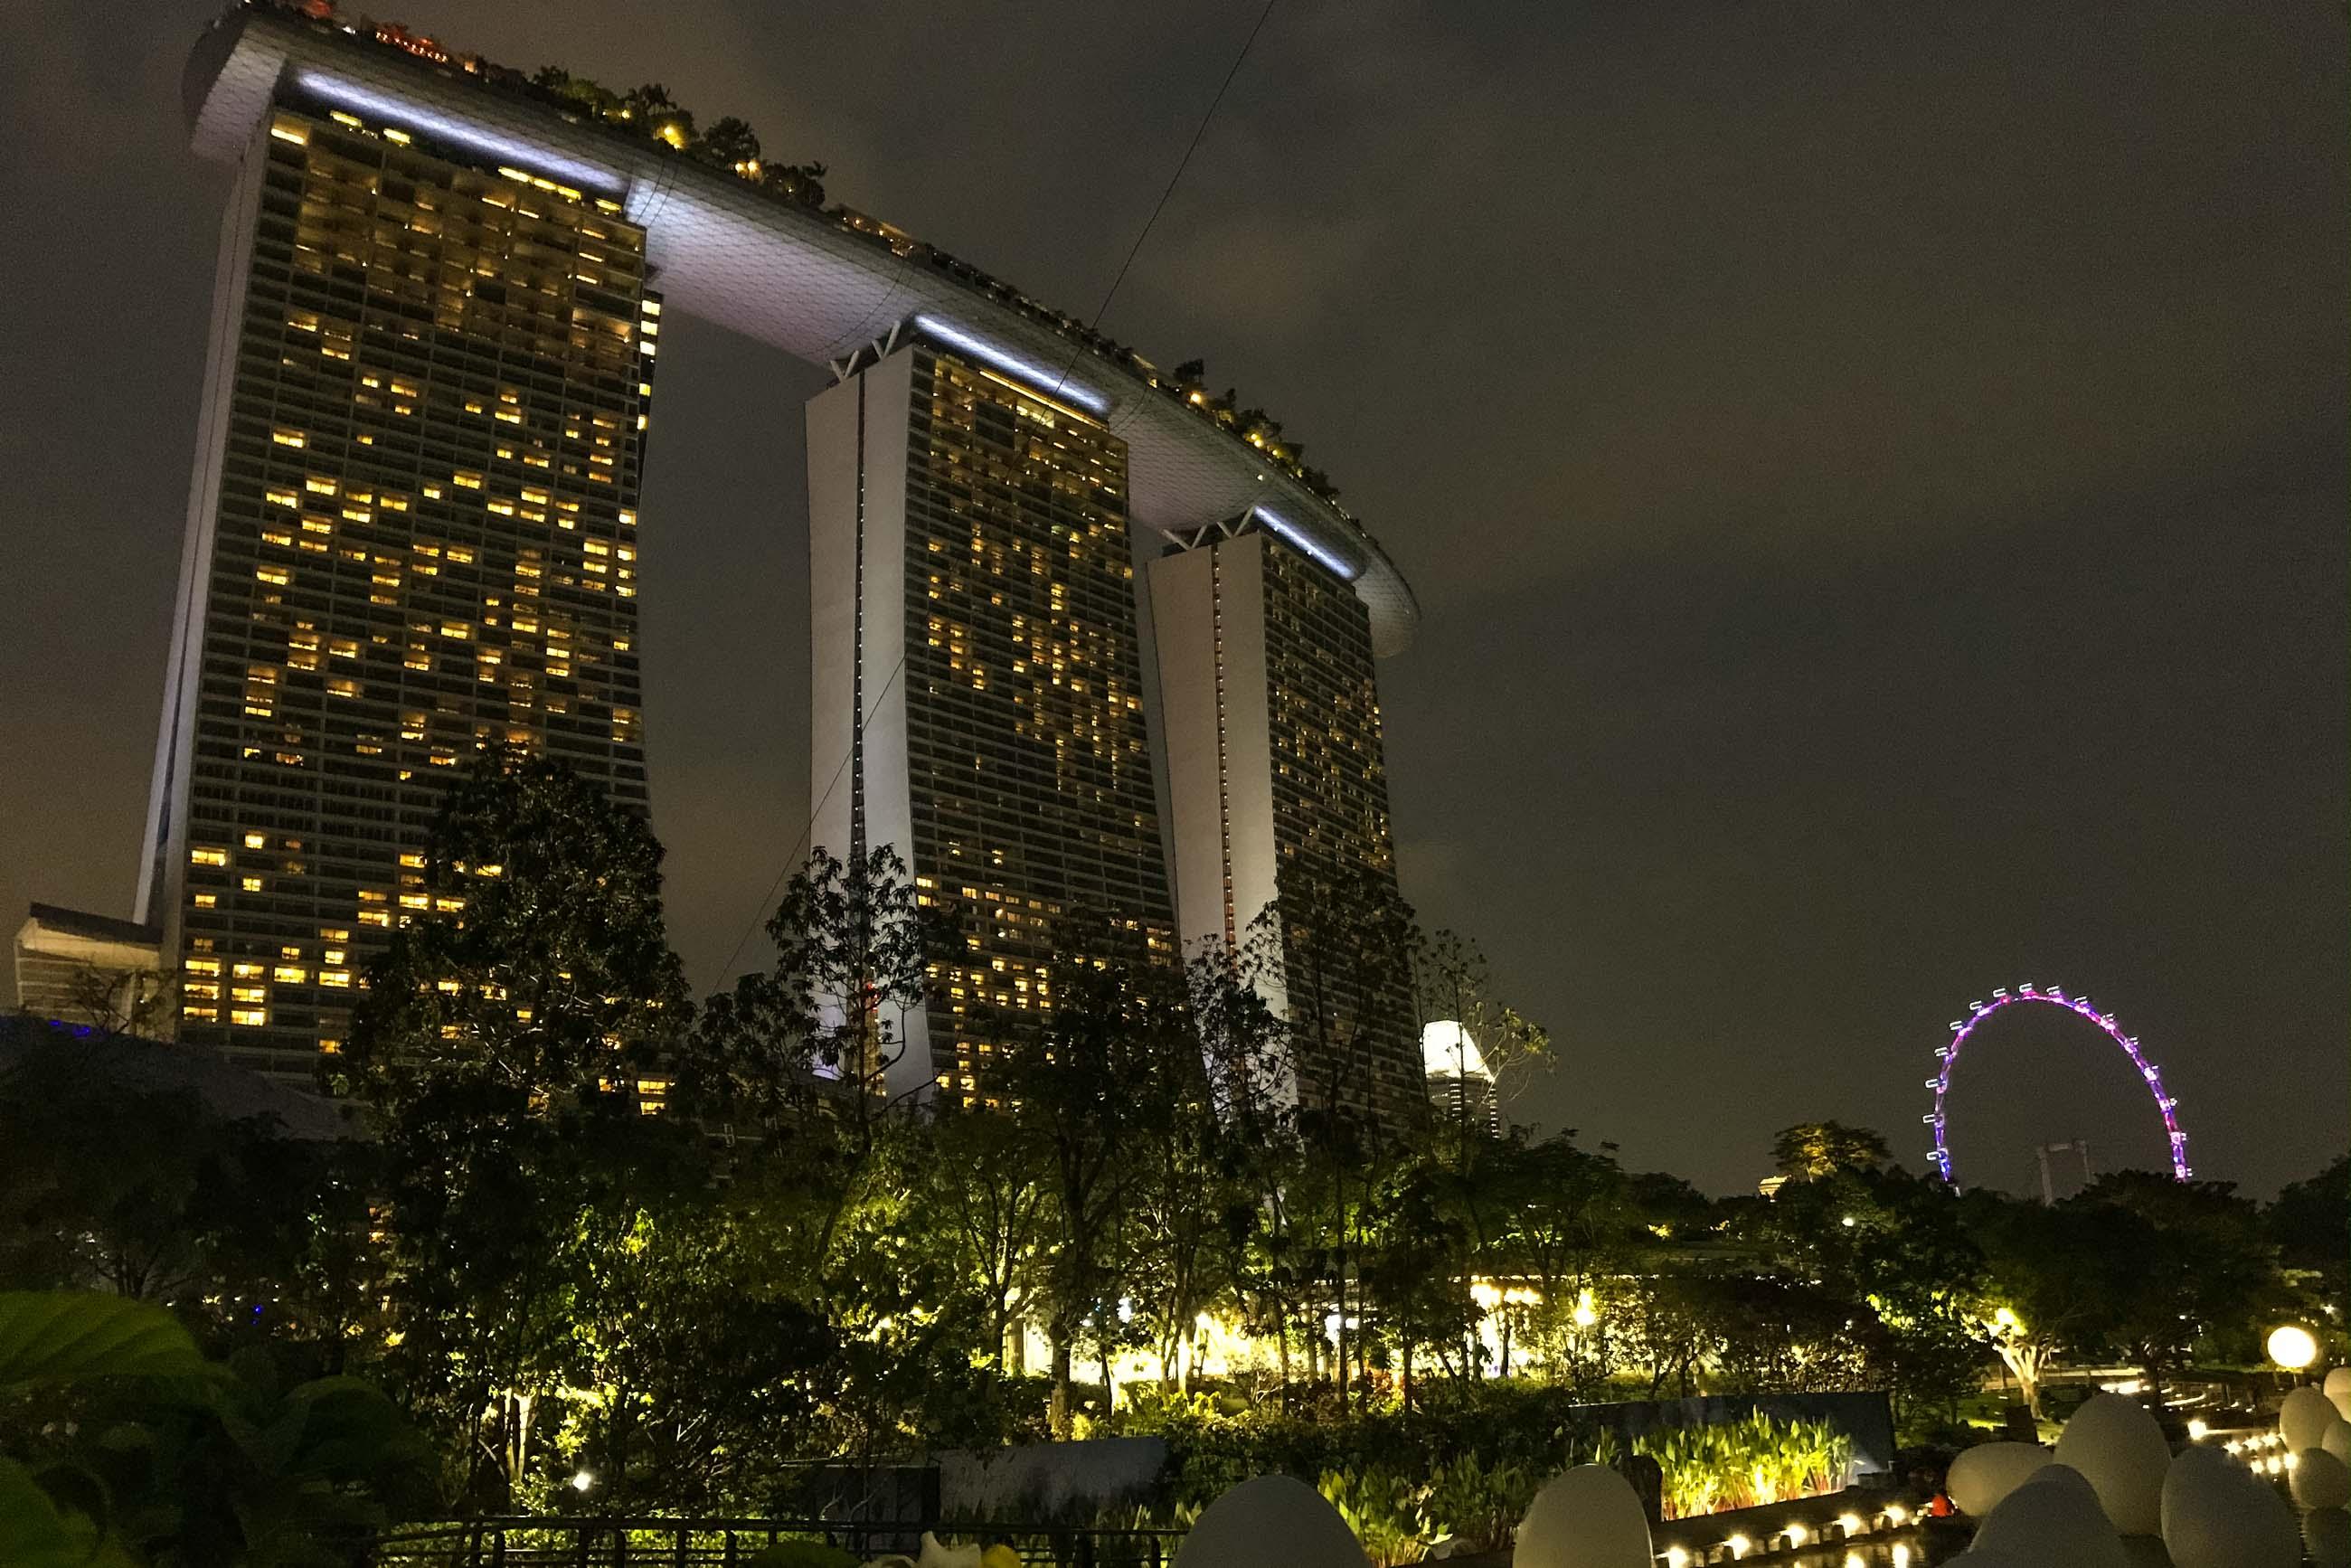 https://bubo.sk/uploads/galleries/5060/michal-pollak--marina-bay-sands--singapore-2.jpg